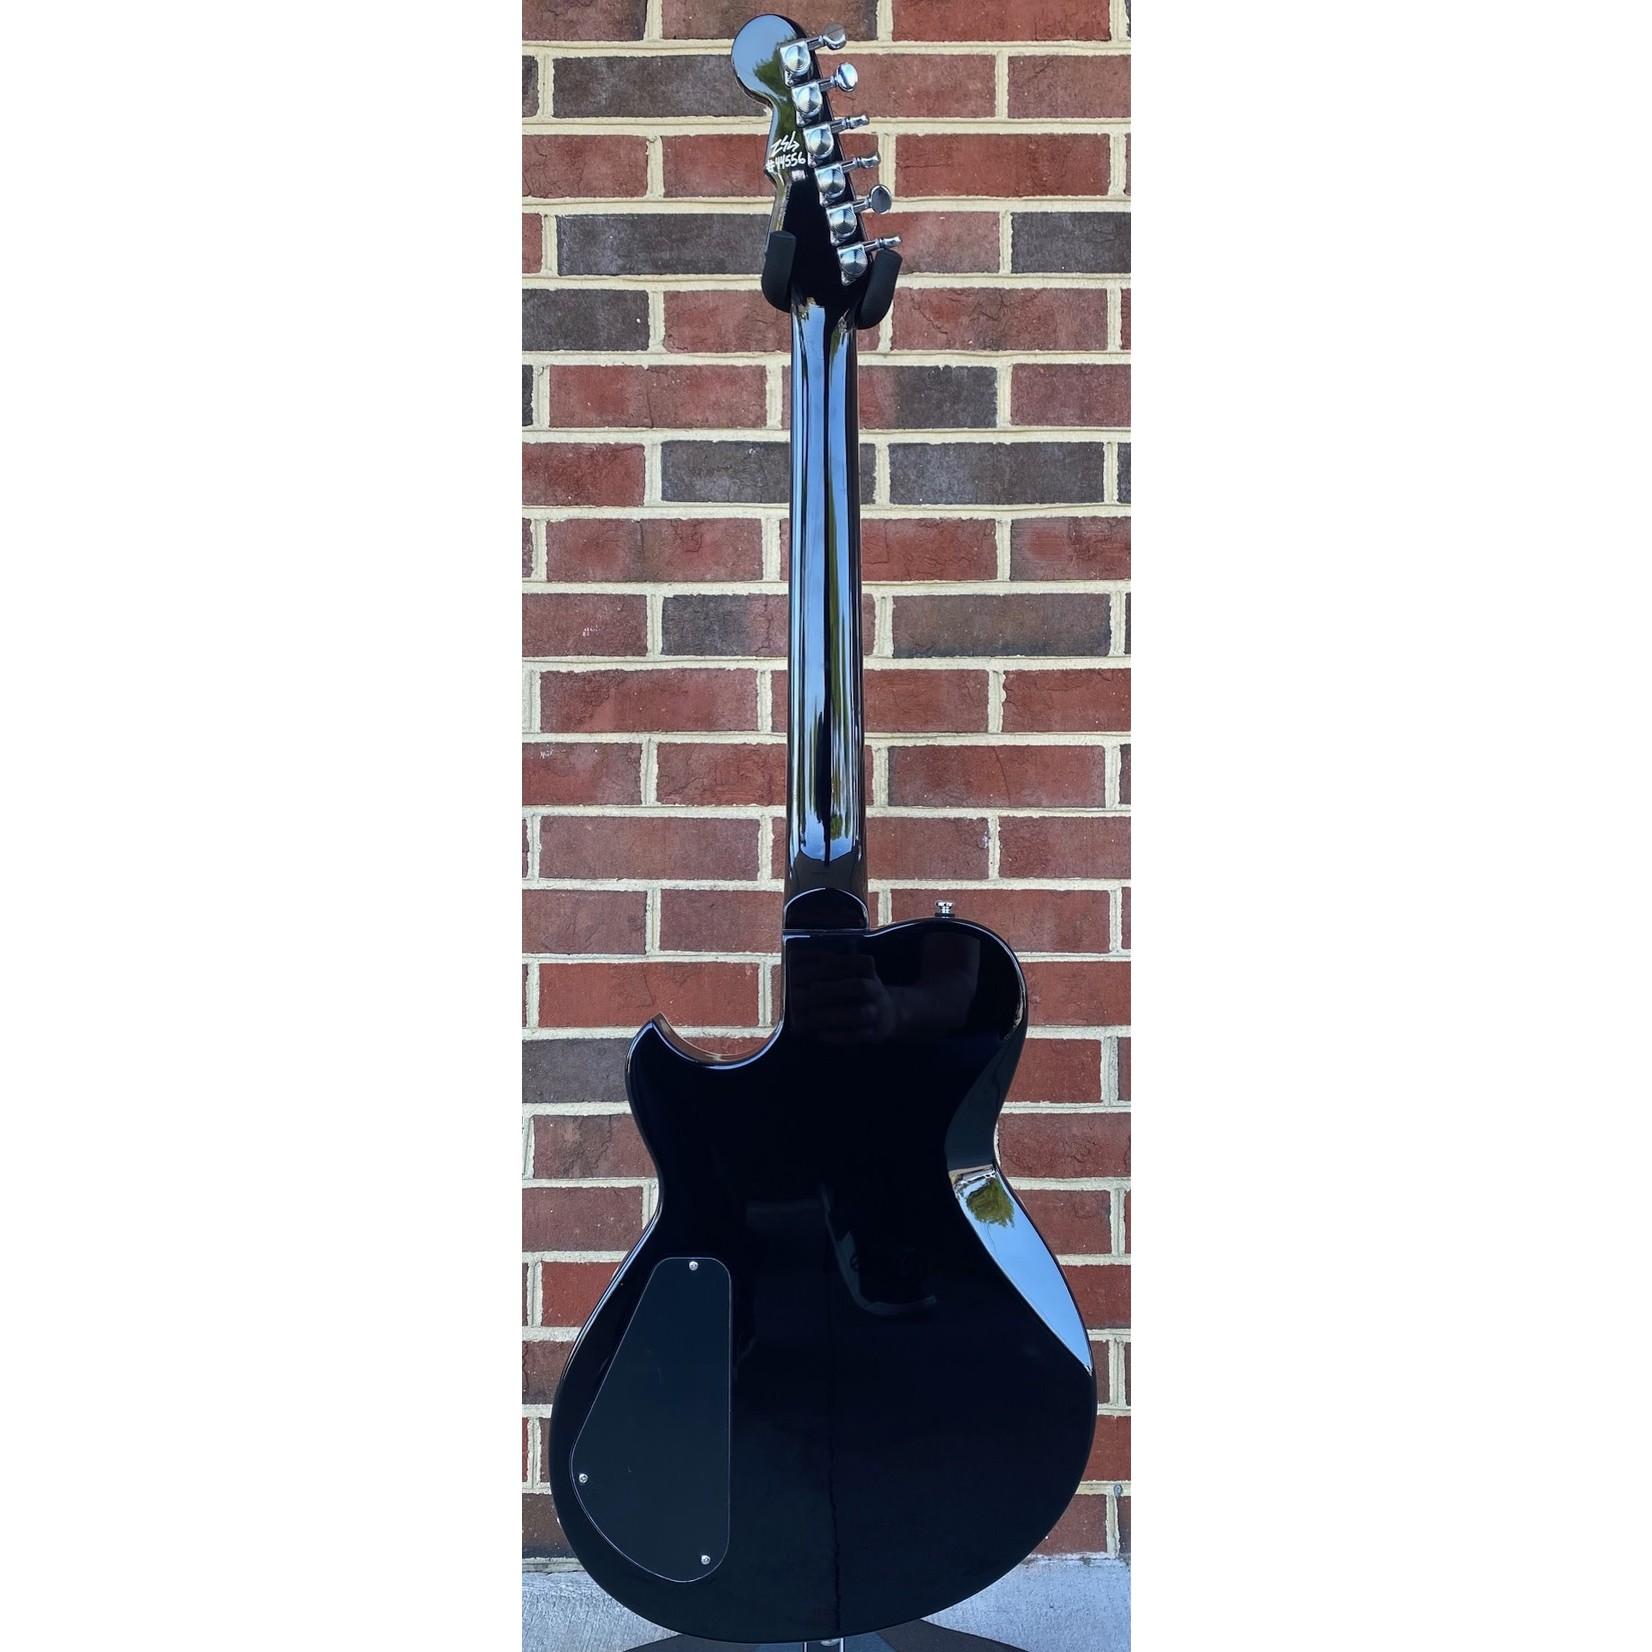 Reverend Reverend Guitars Contender 290, Midnight Black, Roasted Maple Neck, Pau Ferro Fretboard, Korina Body, Locking Tuners